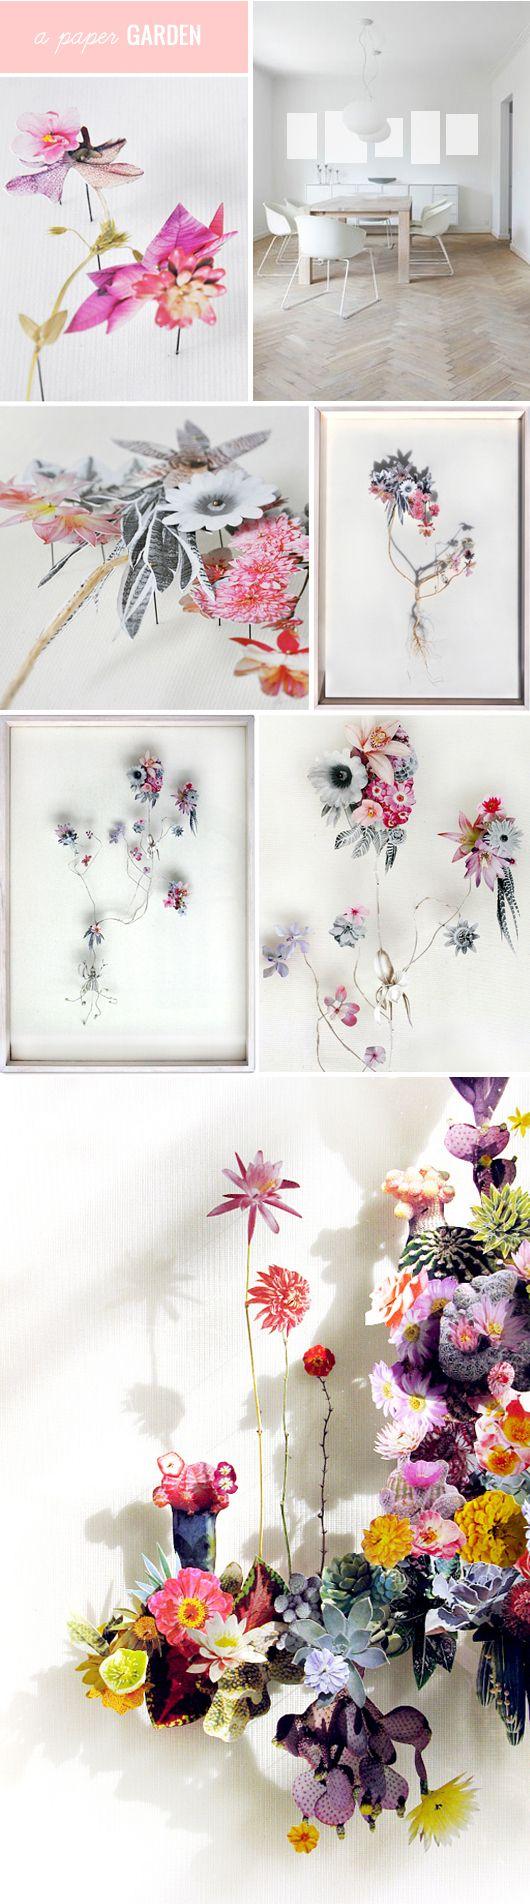 "anne ten donkelaar - paper flowers from this week's ""ART GOES HERE"" on @sfgirlbybay / victoria smith"